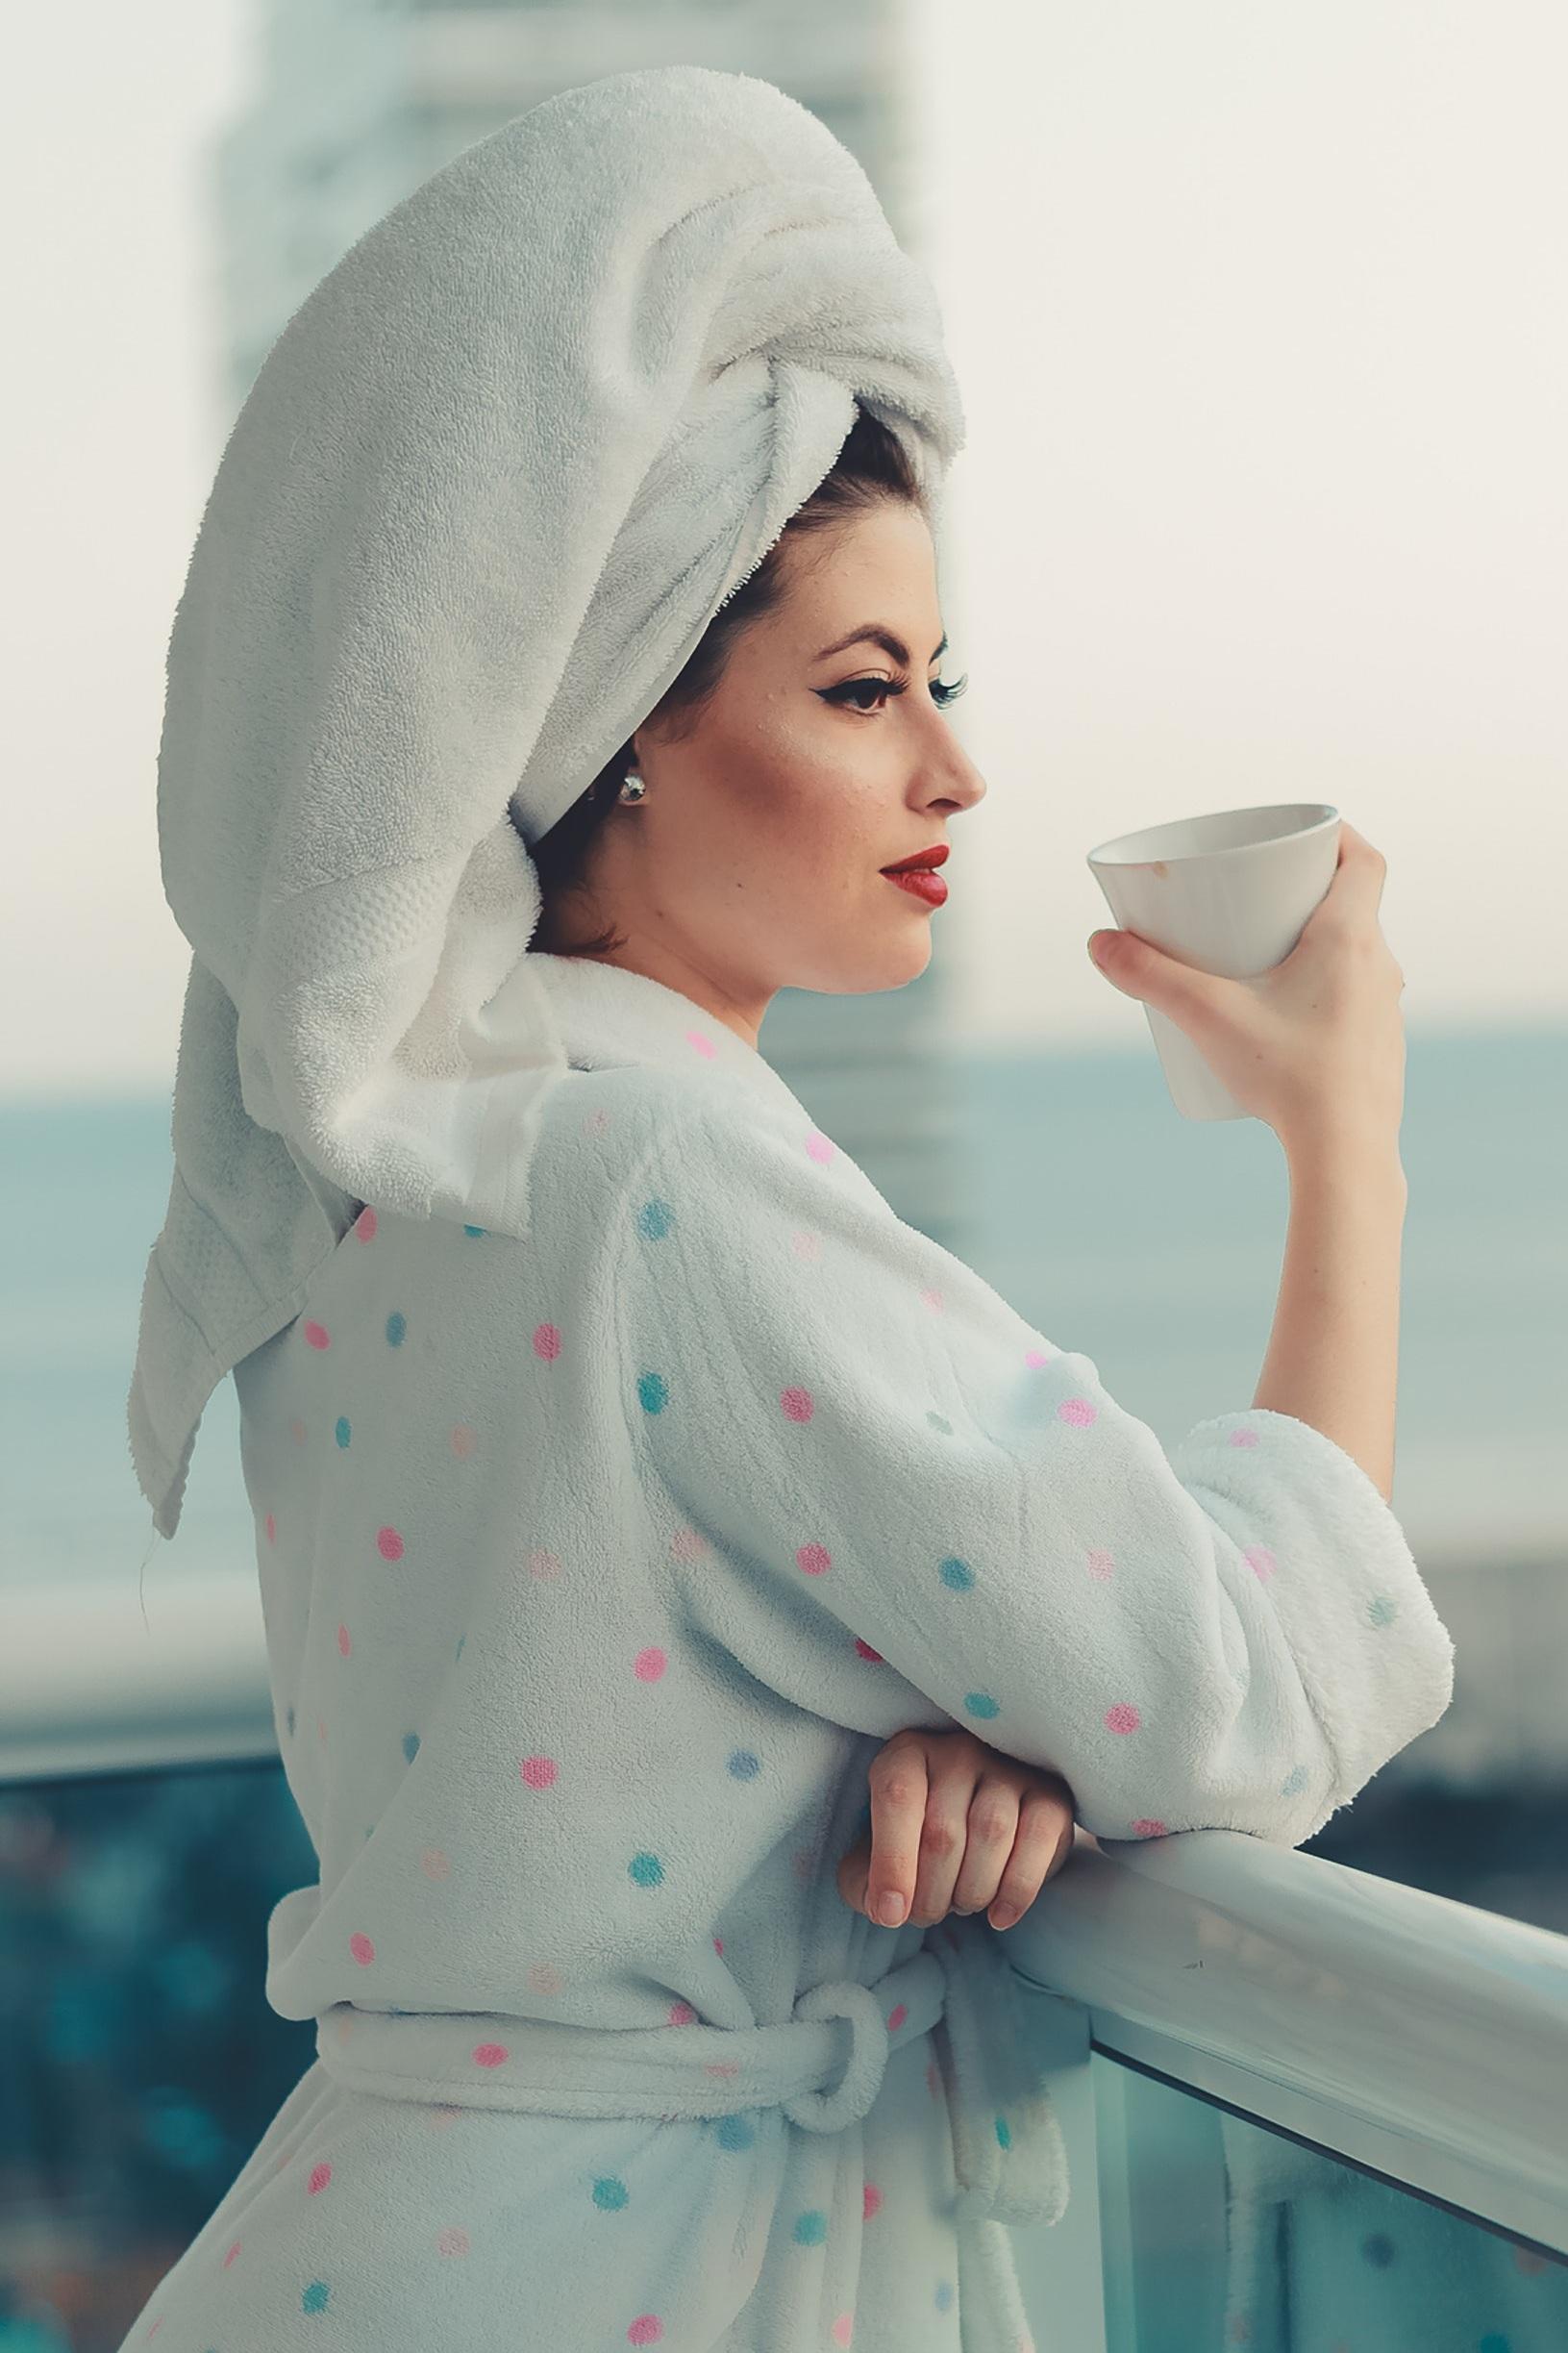 bathrobe-female-leaning-2462996.jpg